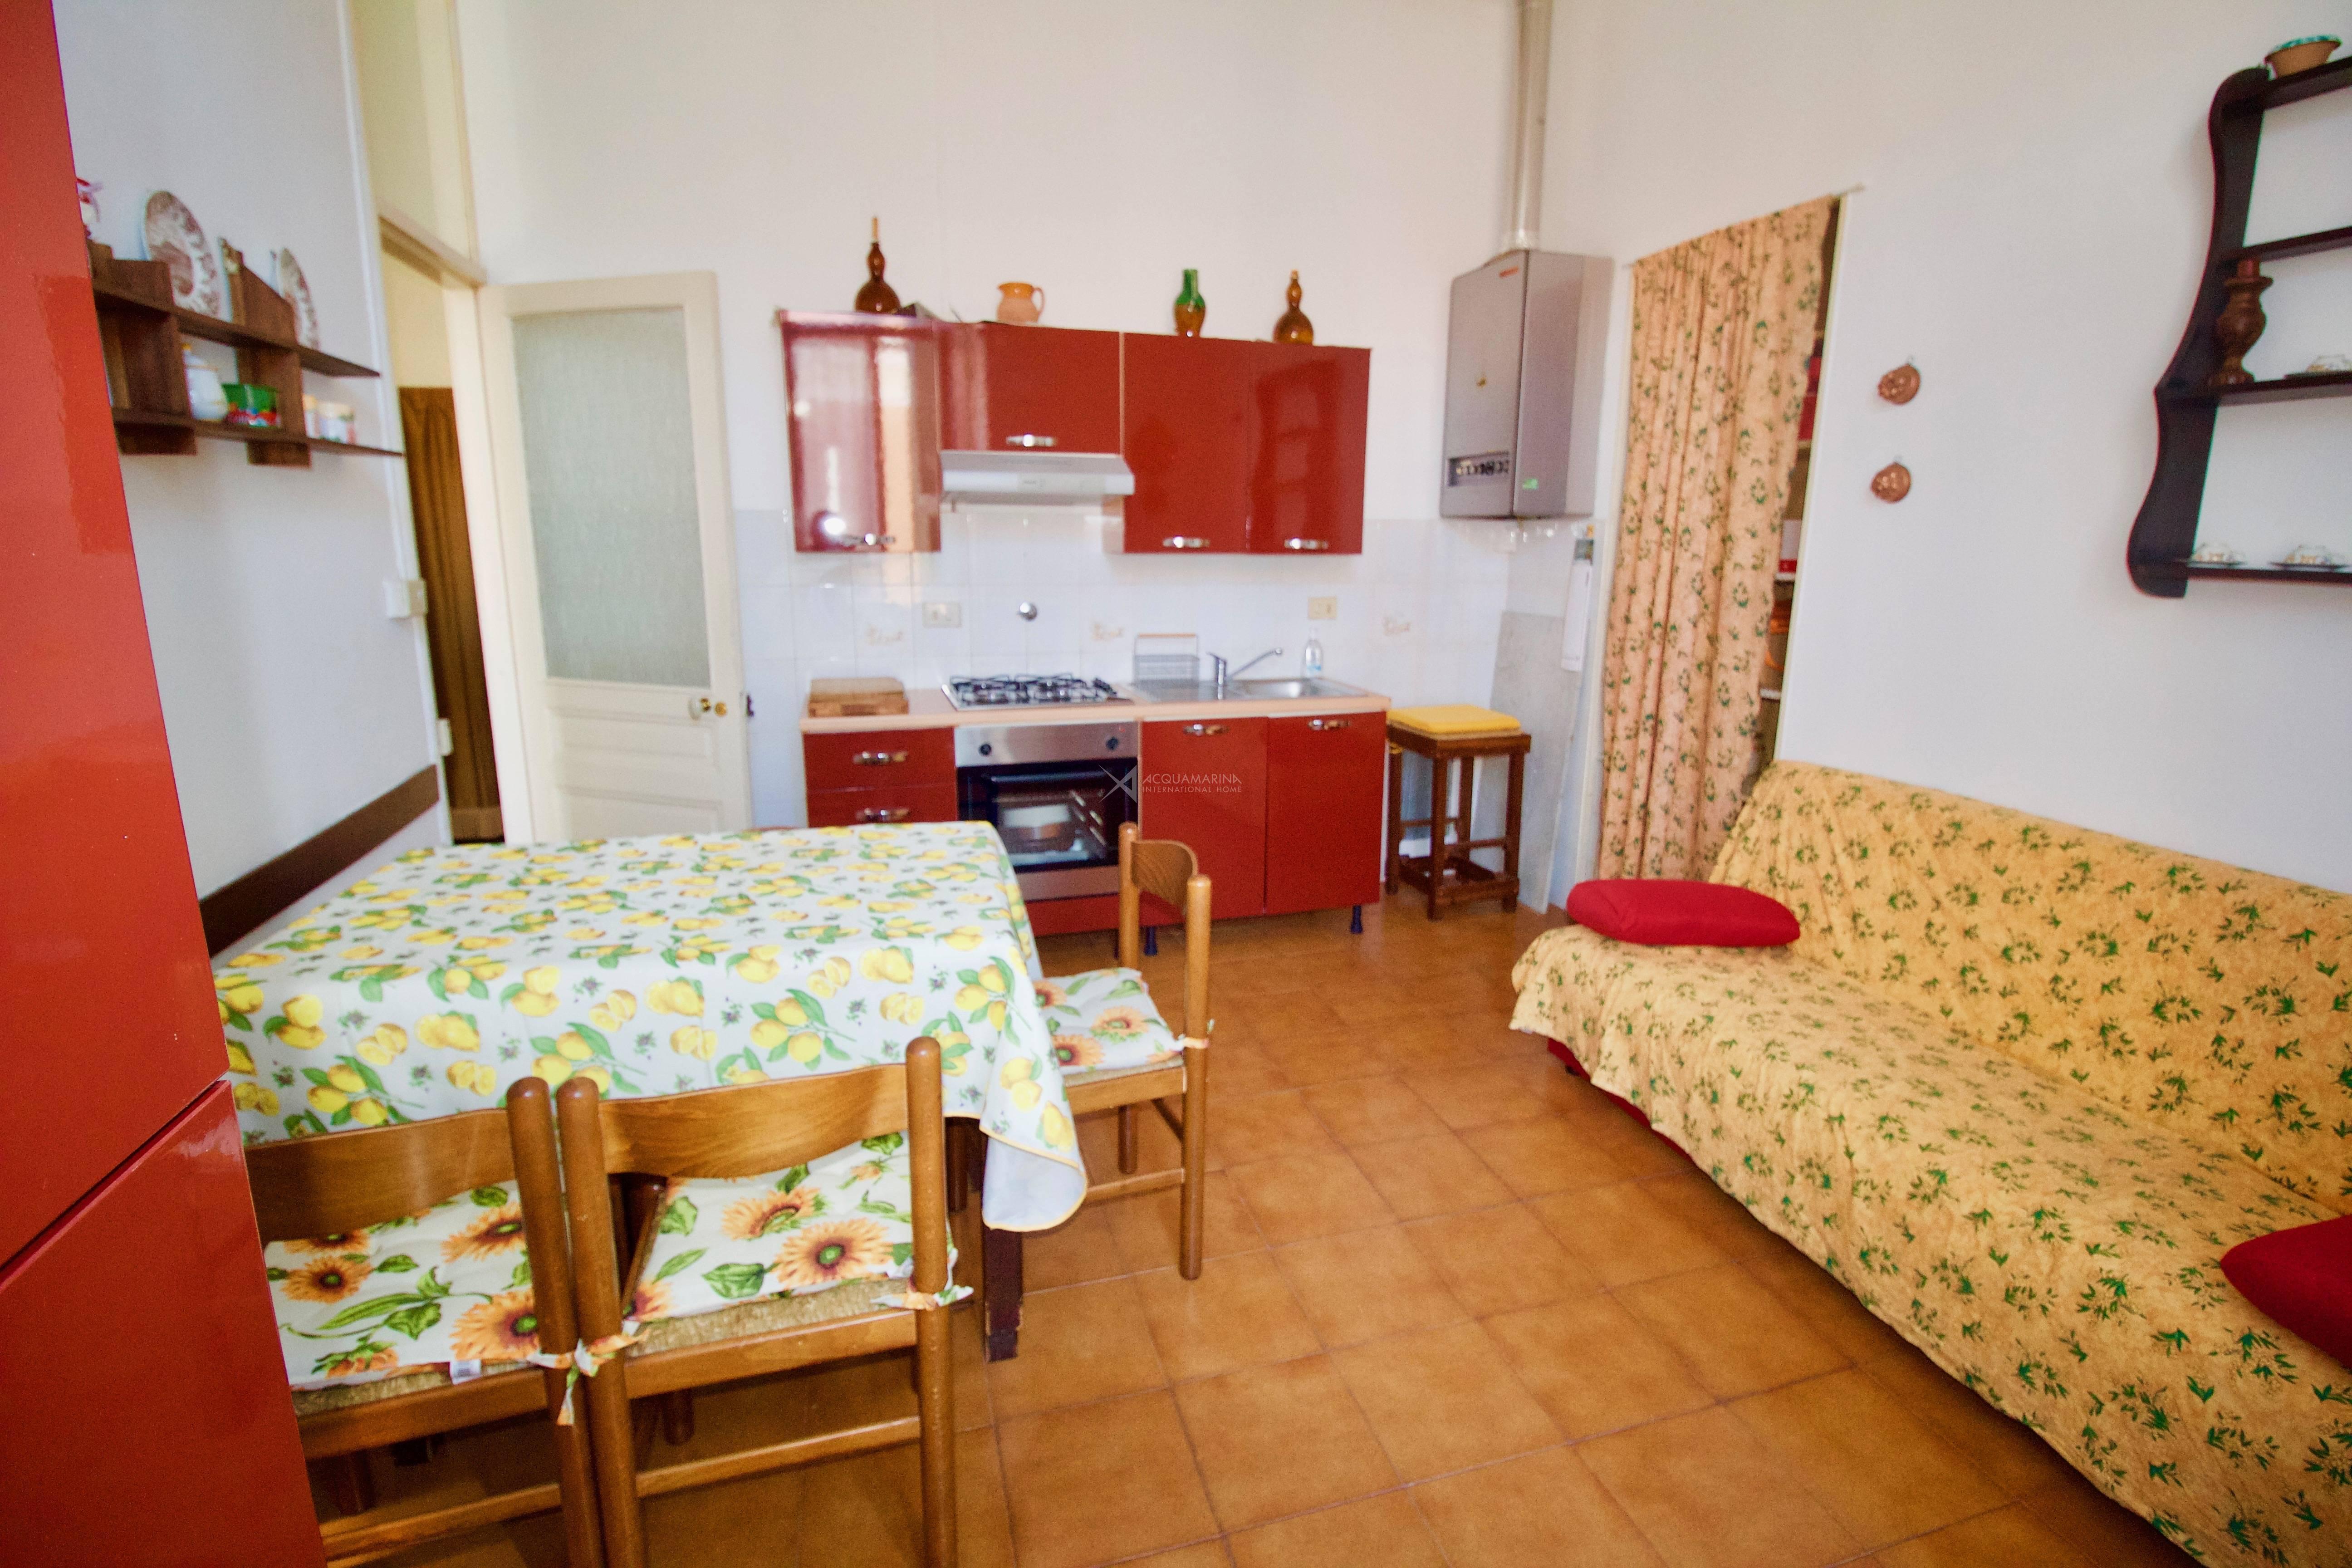 appartement location touristique à Bordighera<br />1/11